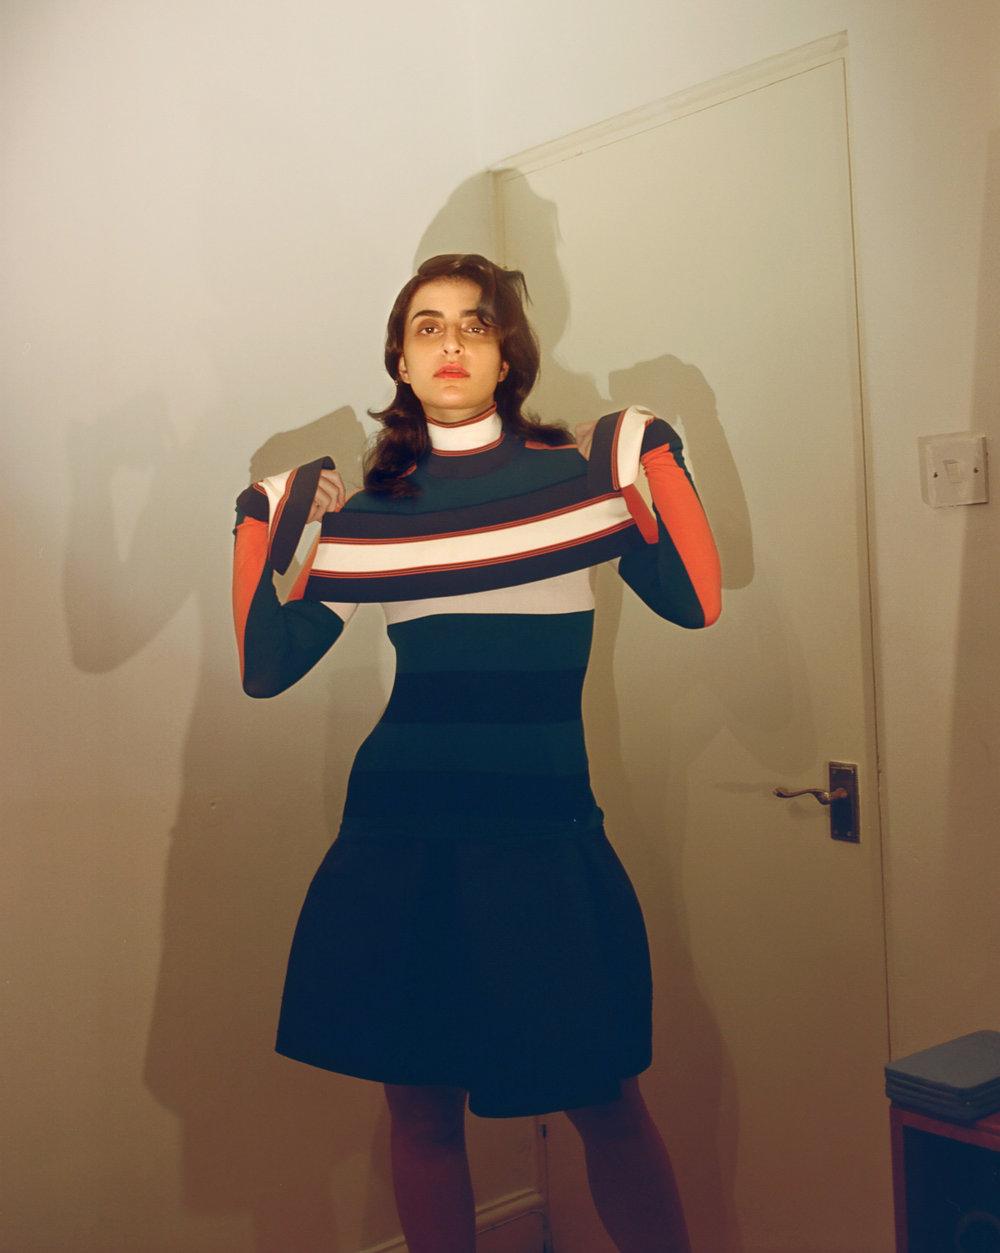 NASSIA MATSA   Height: 5'8  Chest: 32  Waist: 25  Hips: 31  Shoe: UK5  . . .